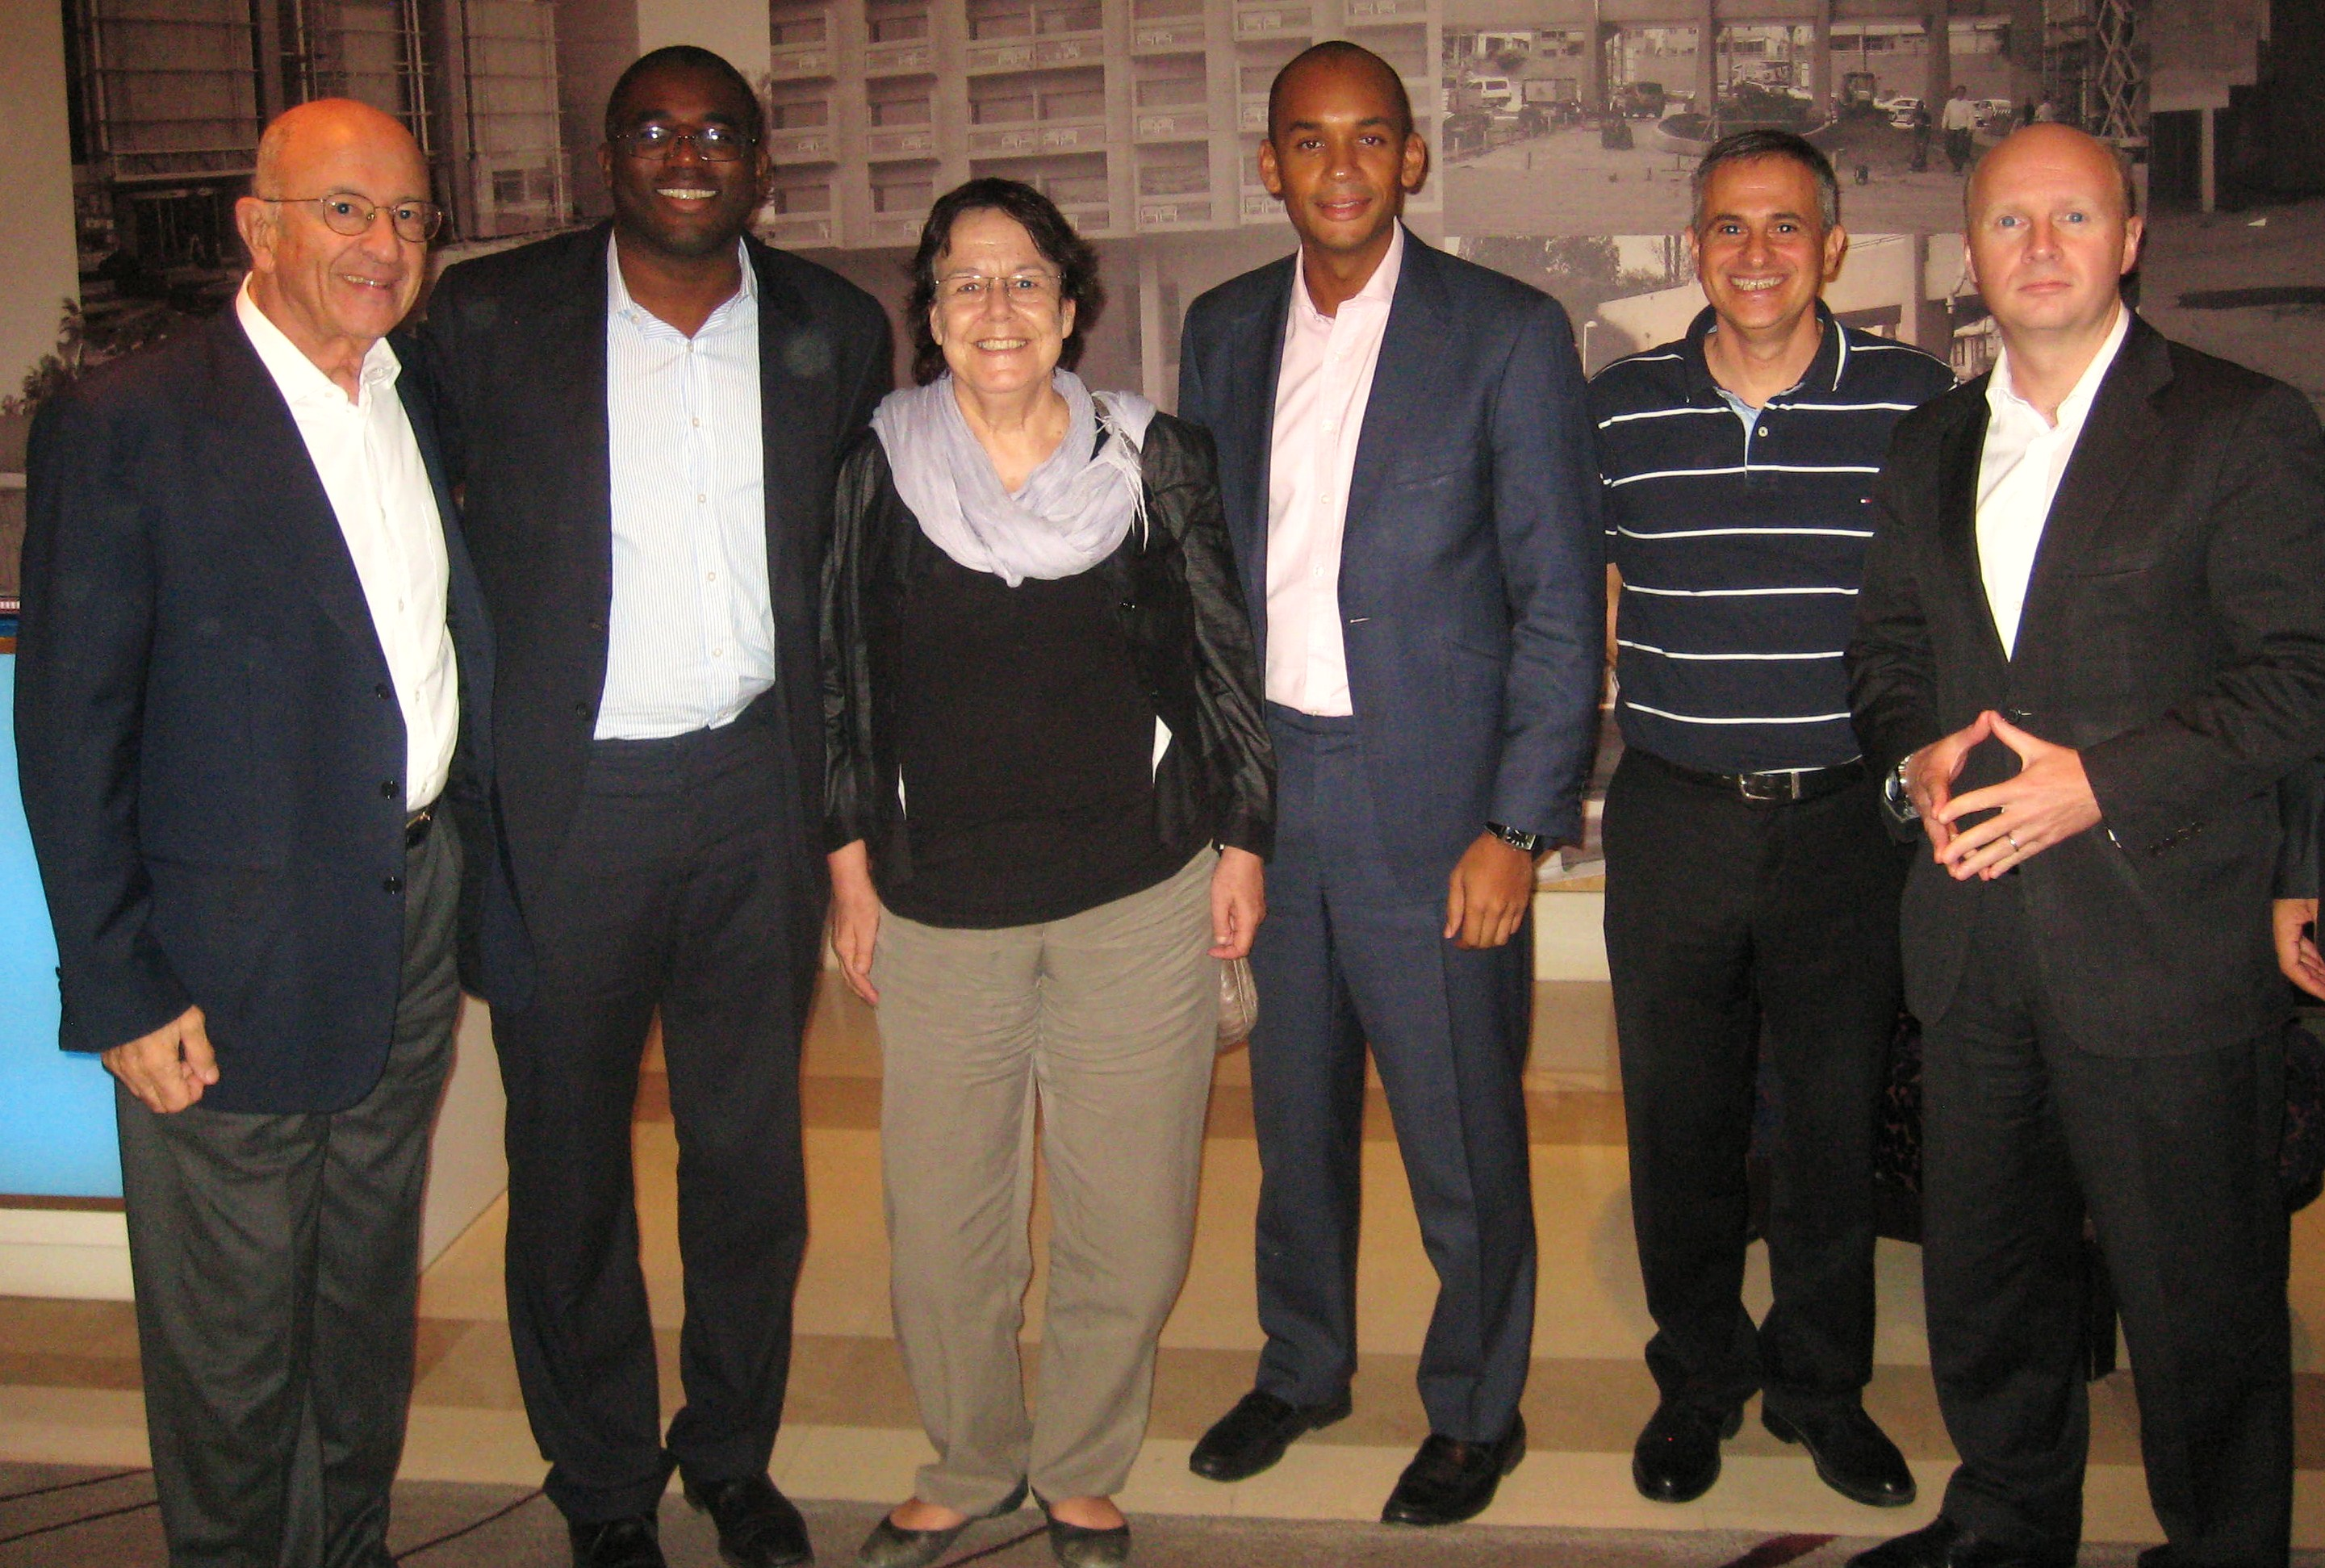 Liam Byrne, Chuka Ummuna, David Lammy and Sir Trevor Chinn with Smadar Nehab of Israel'sTsofen NGO and Jimmy Levy of Galil Software